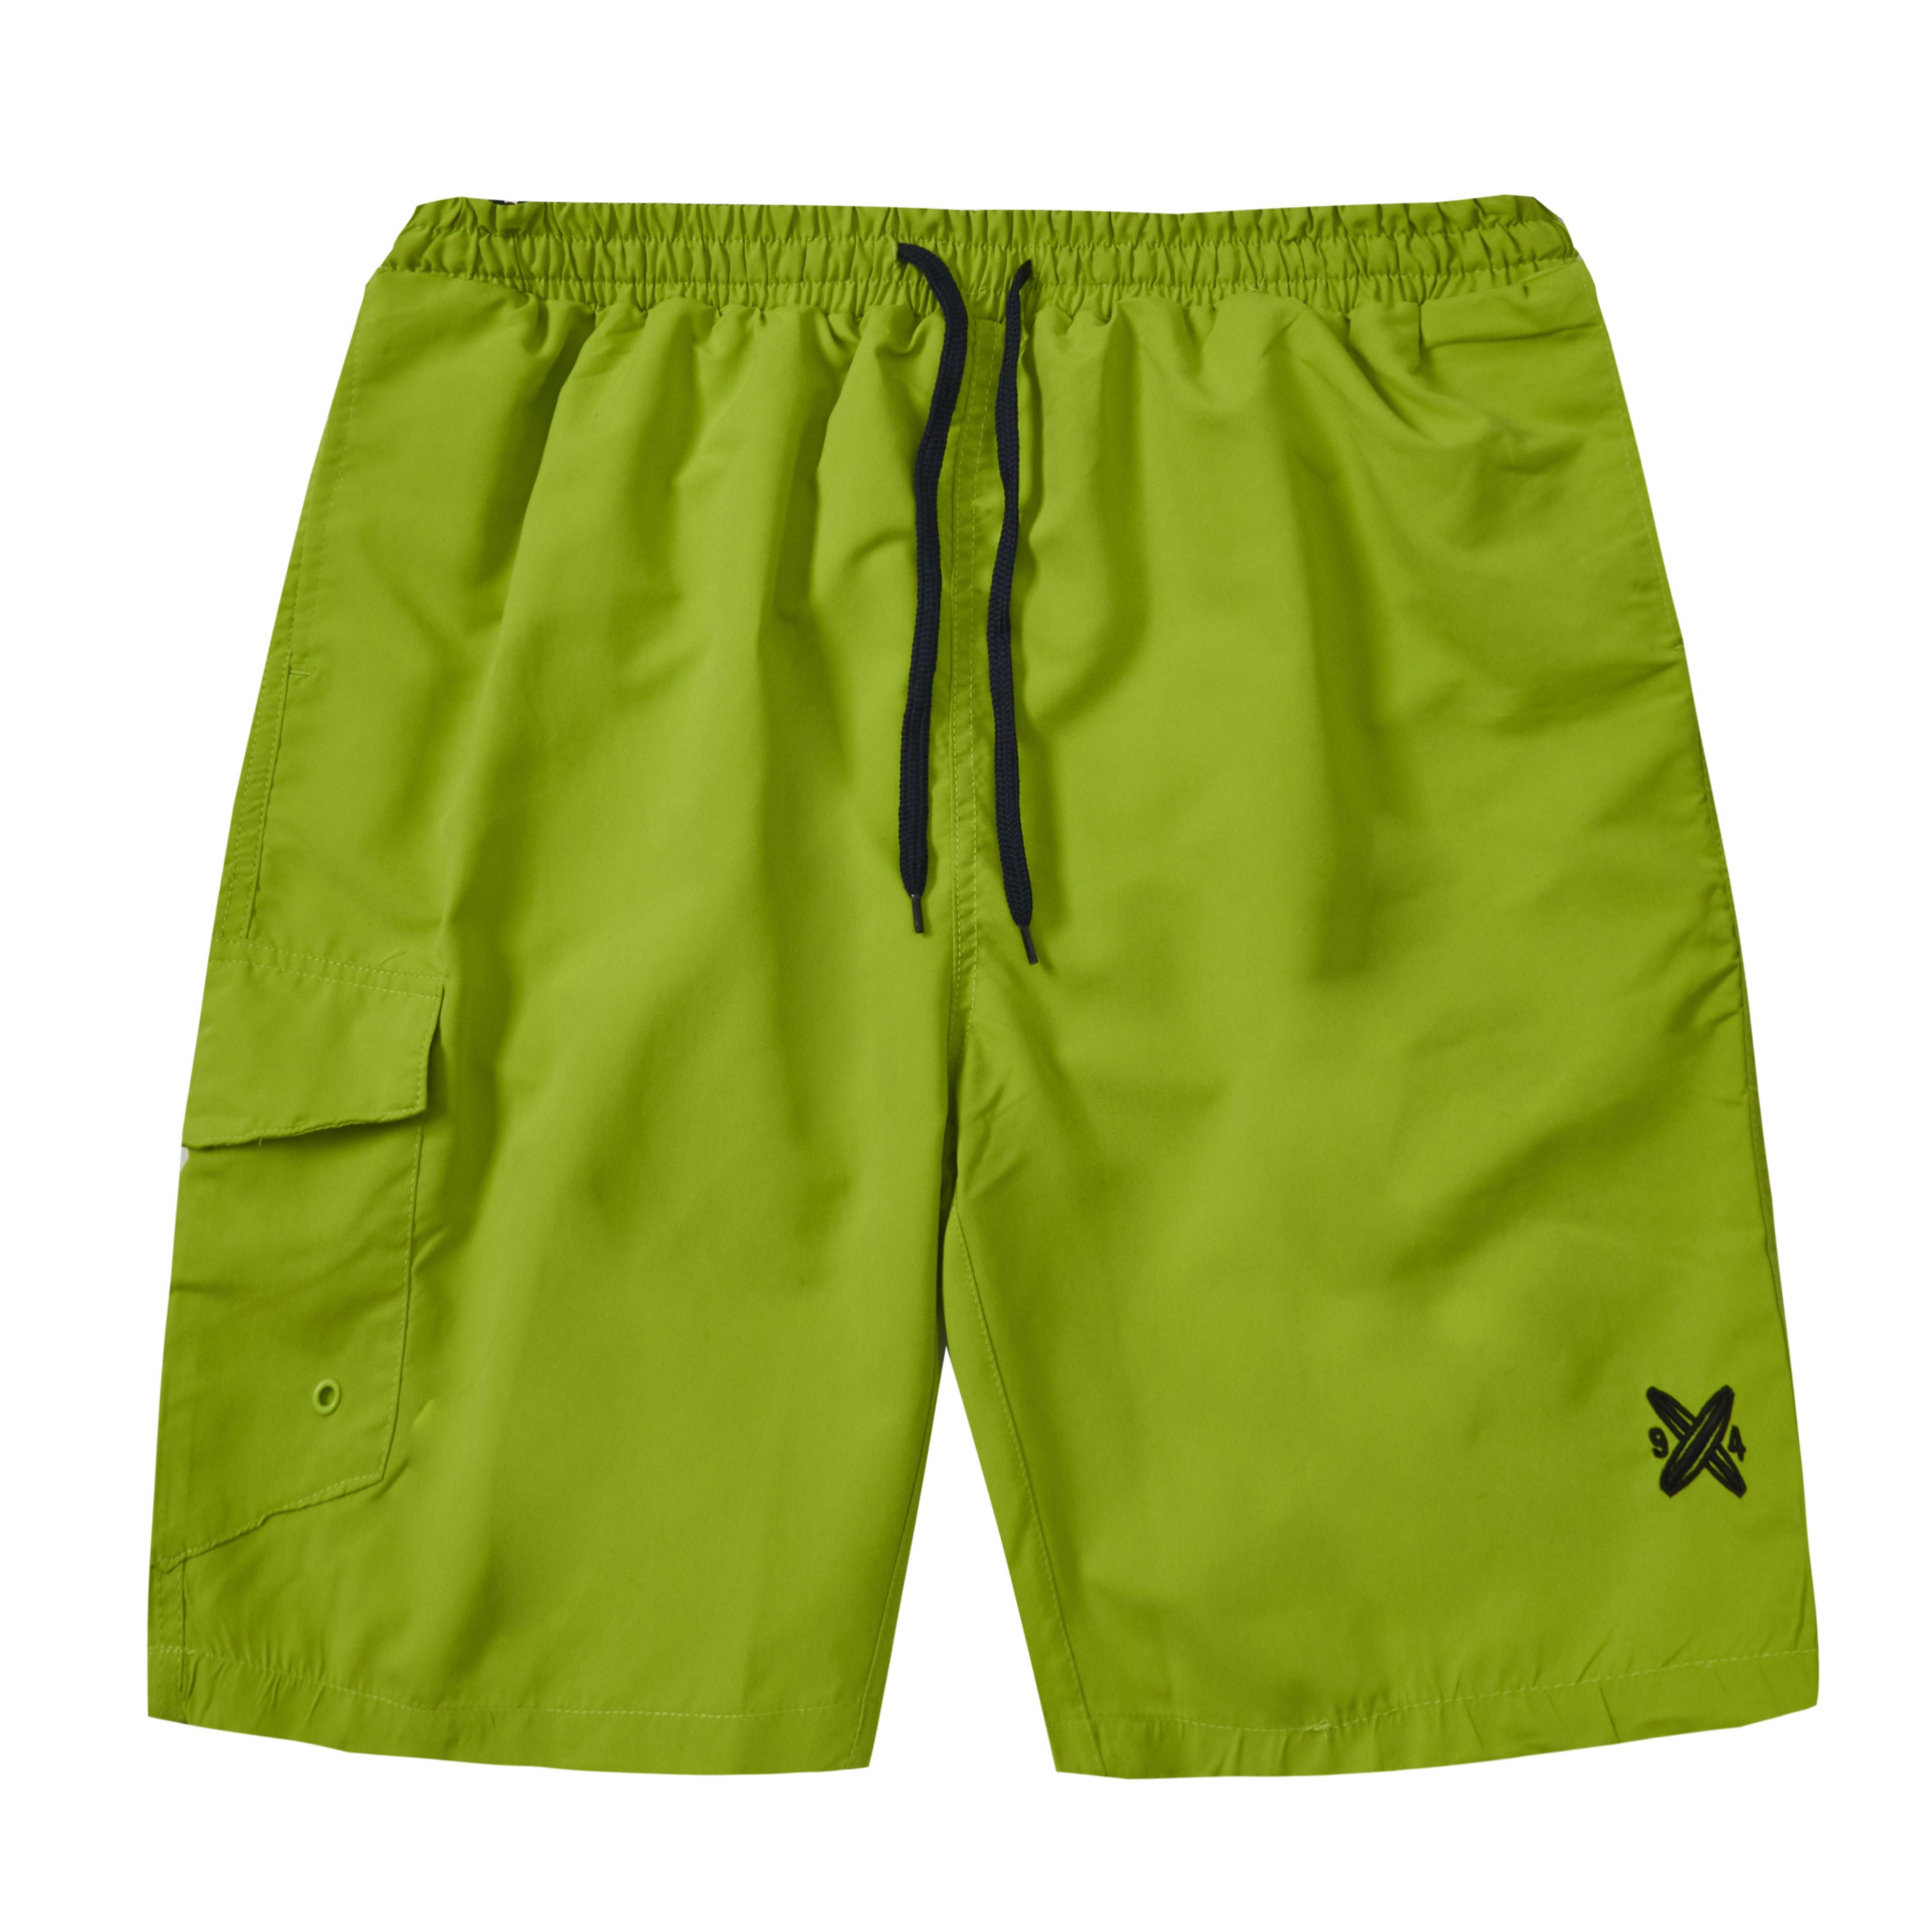 Baum Side Pocket Swim Shorts Green